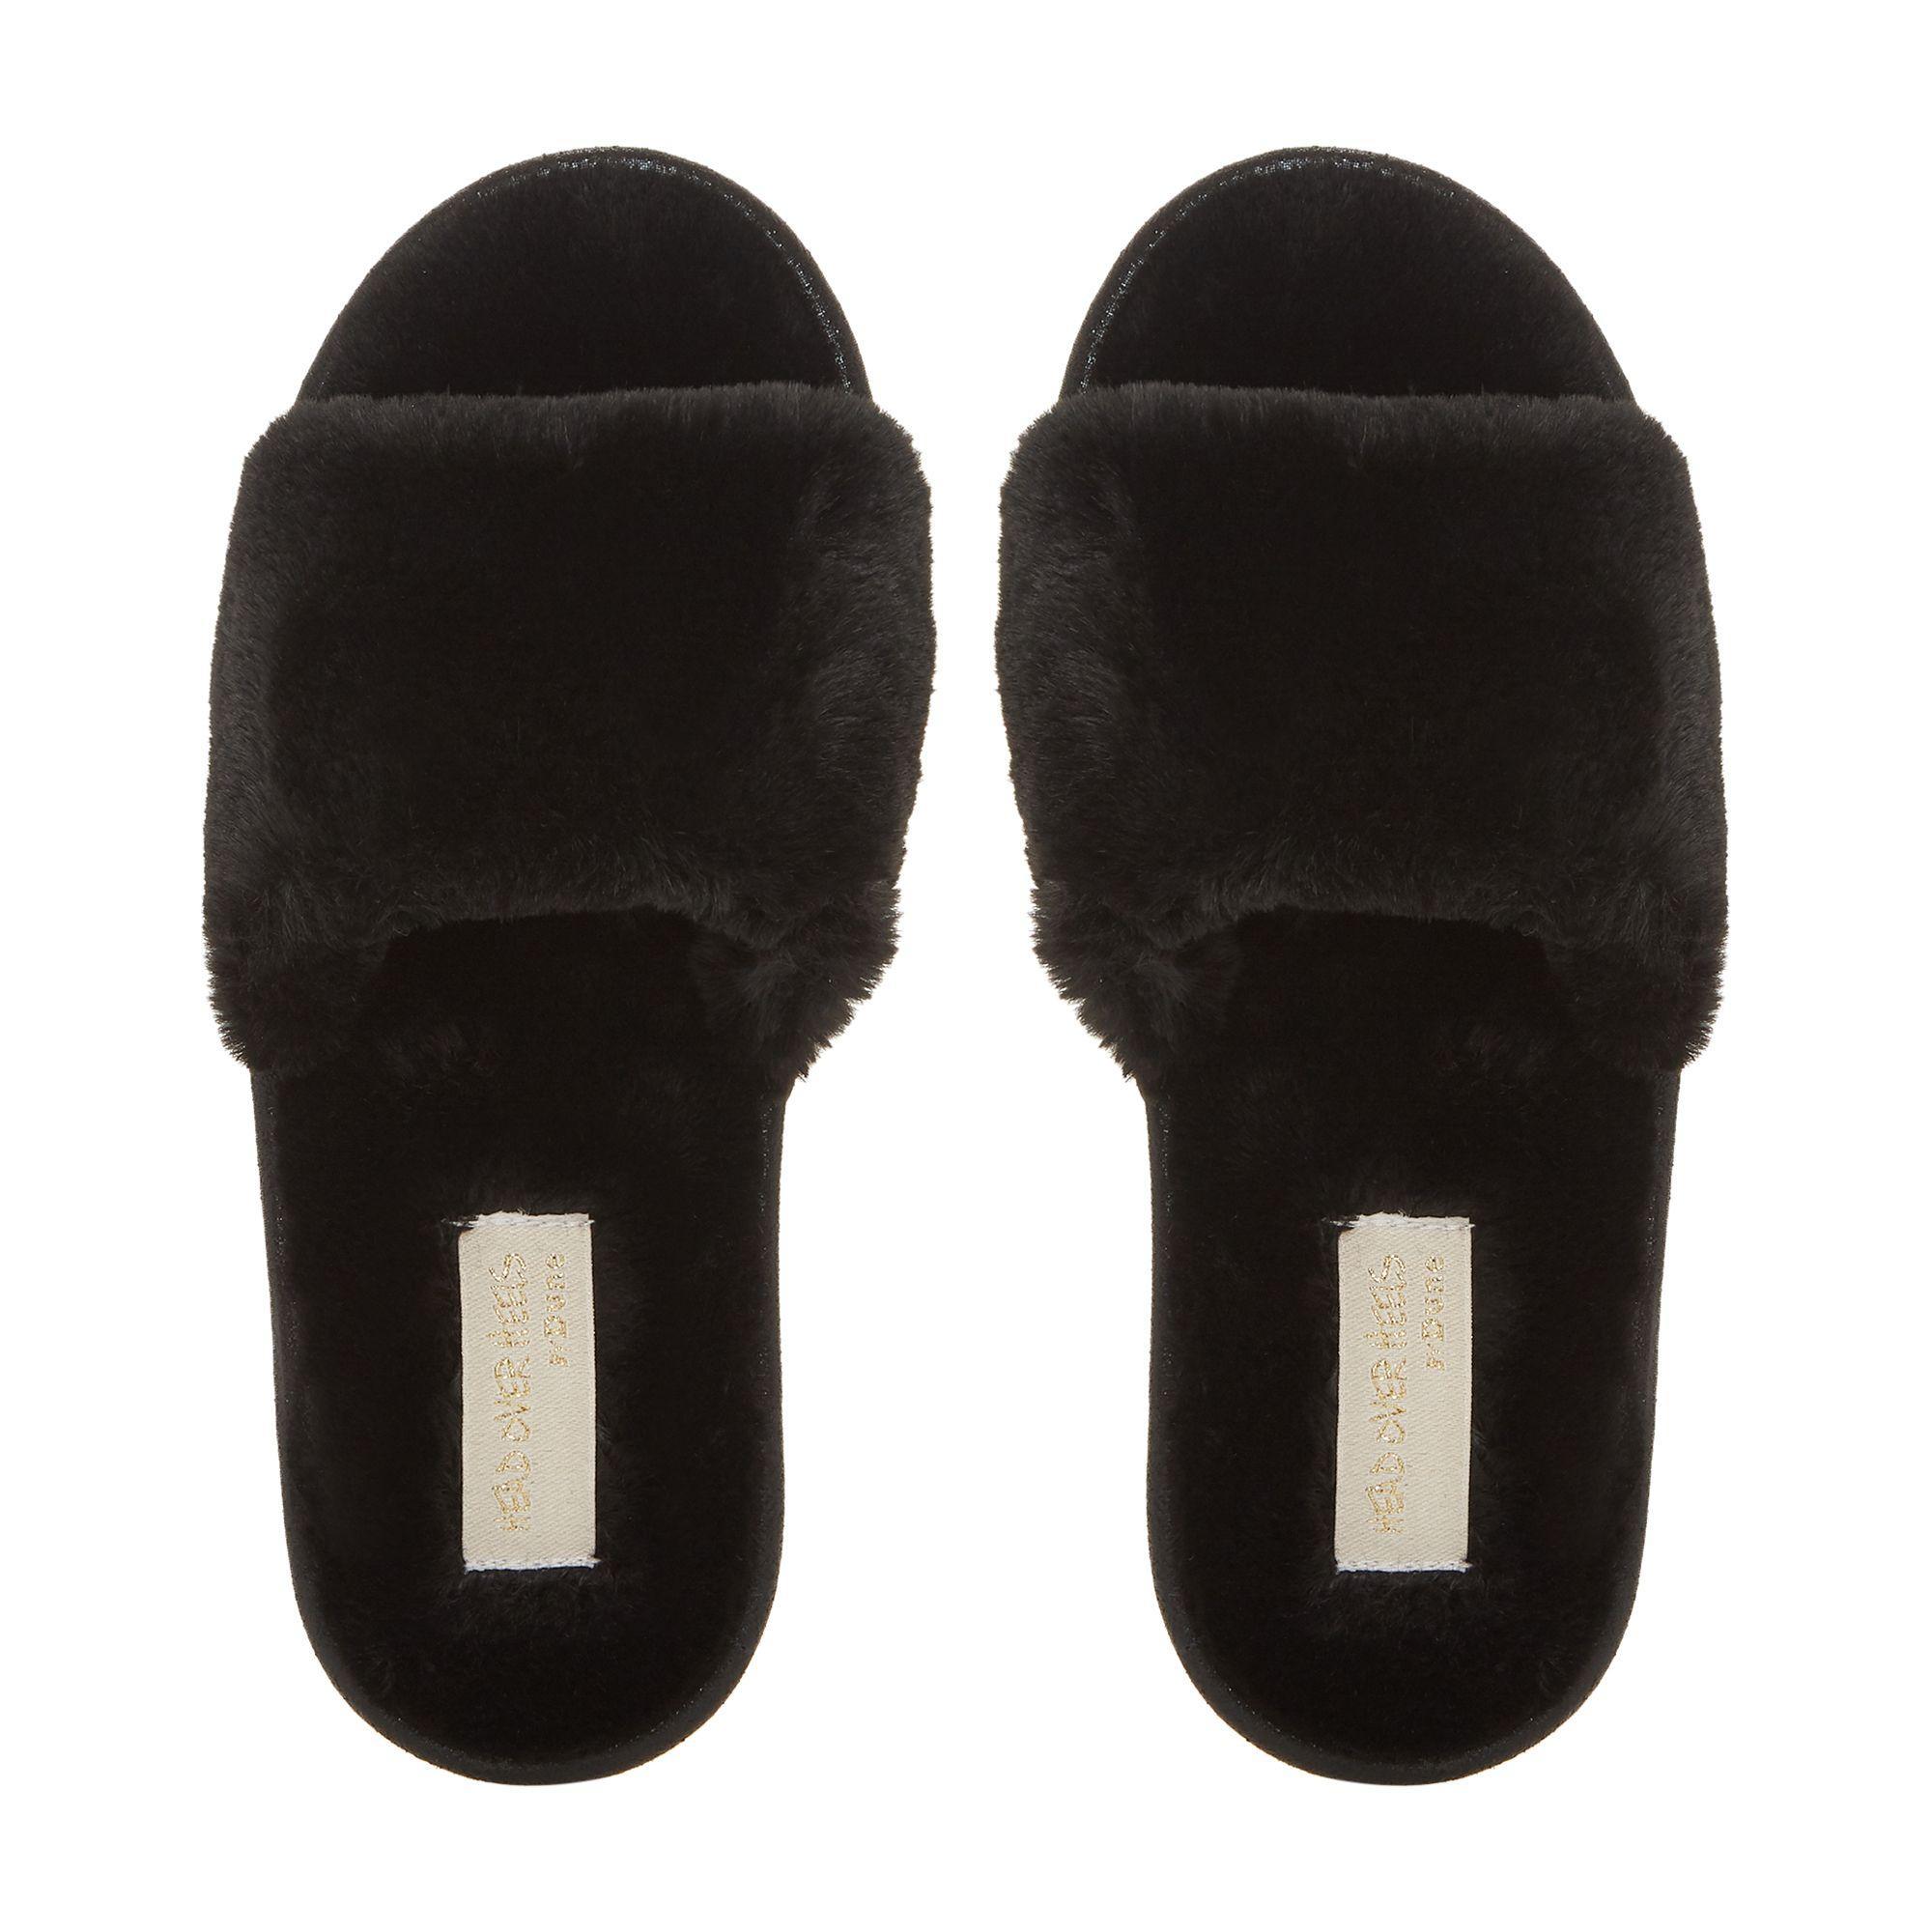 b25f3e35b49 Dune Black Fluffy Mule Slippers in Black - Lyst